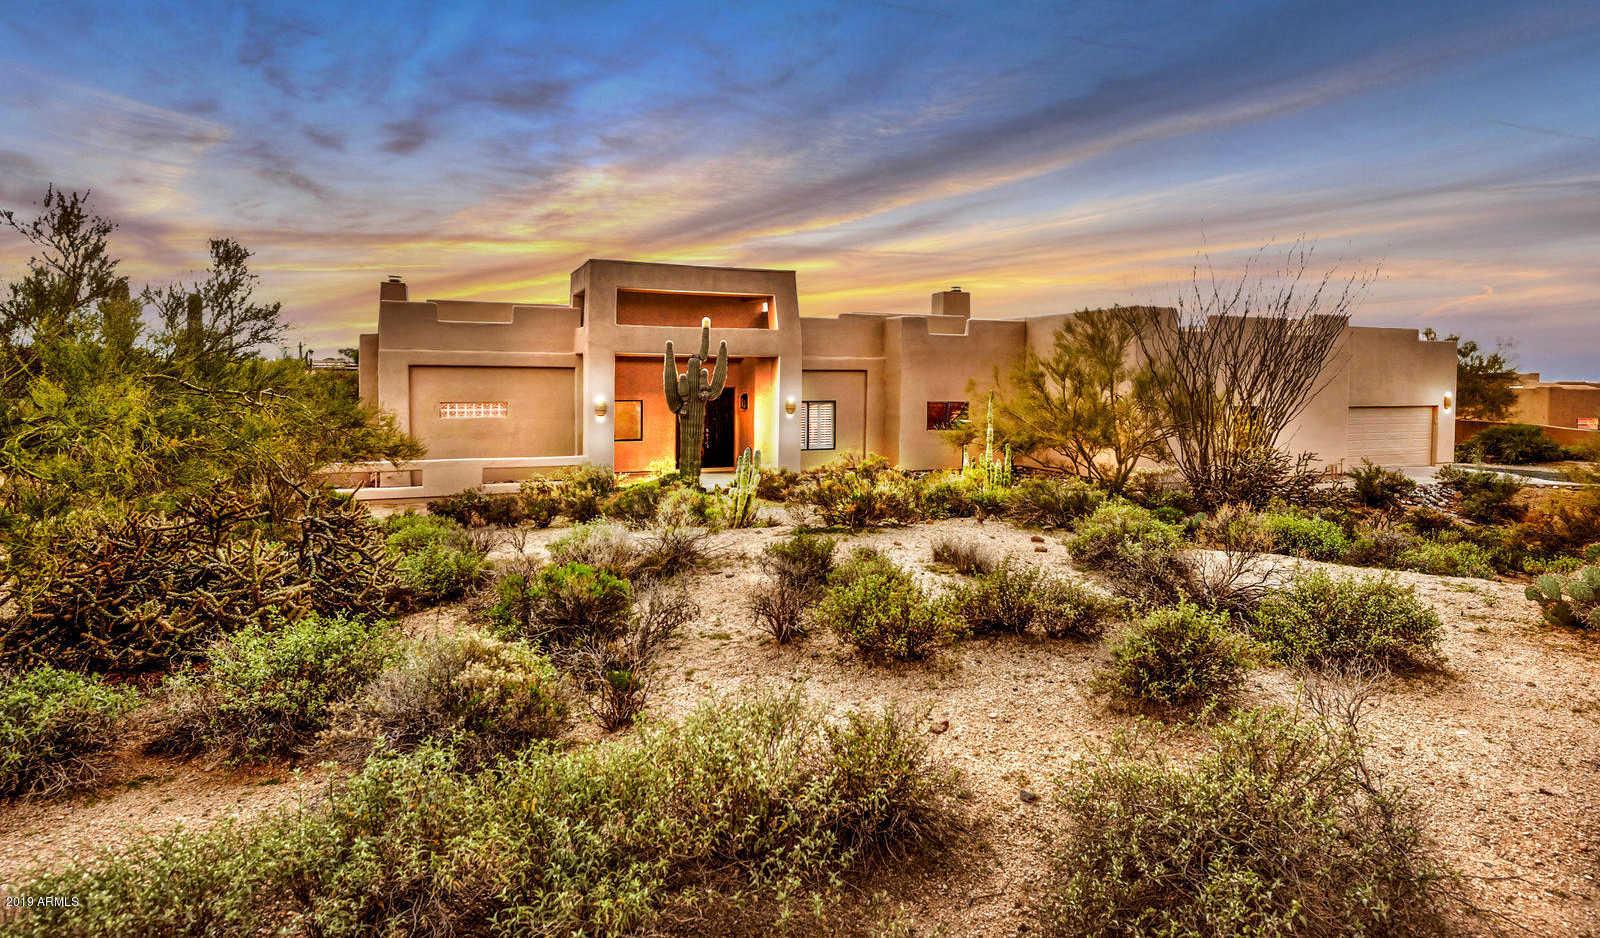 $575,000 - 4Br/4Ba - Home for Sale in Velvet Shadows, Carefree